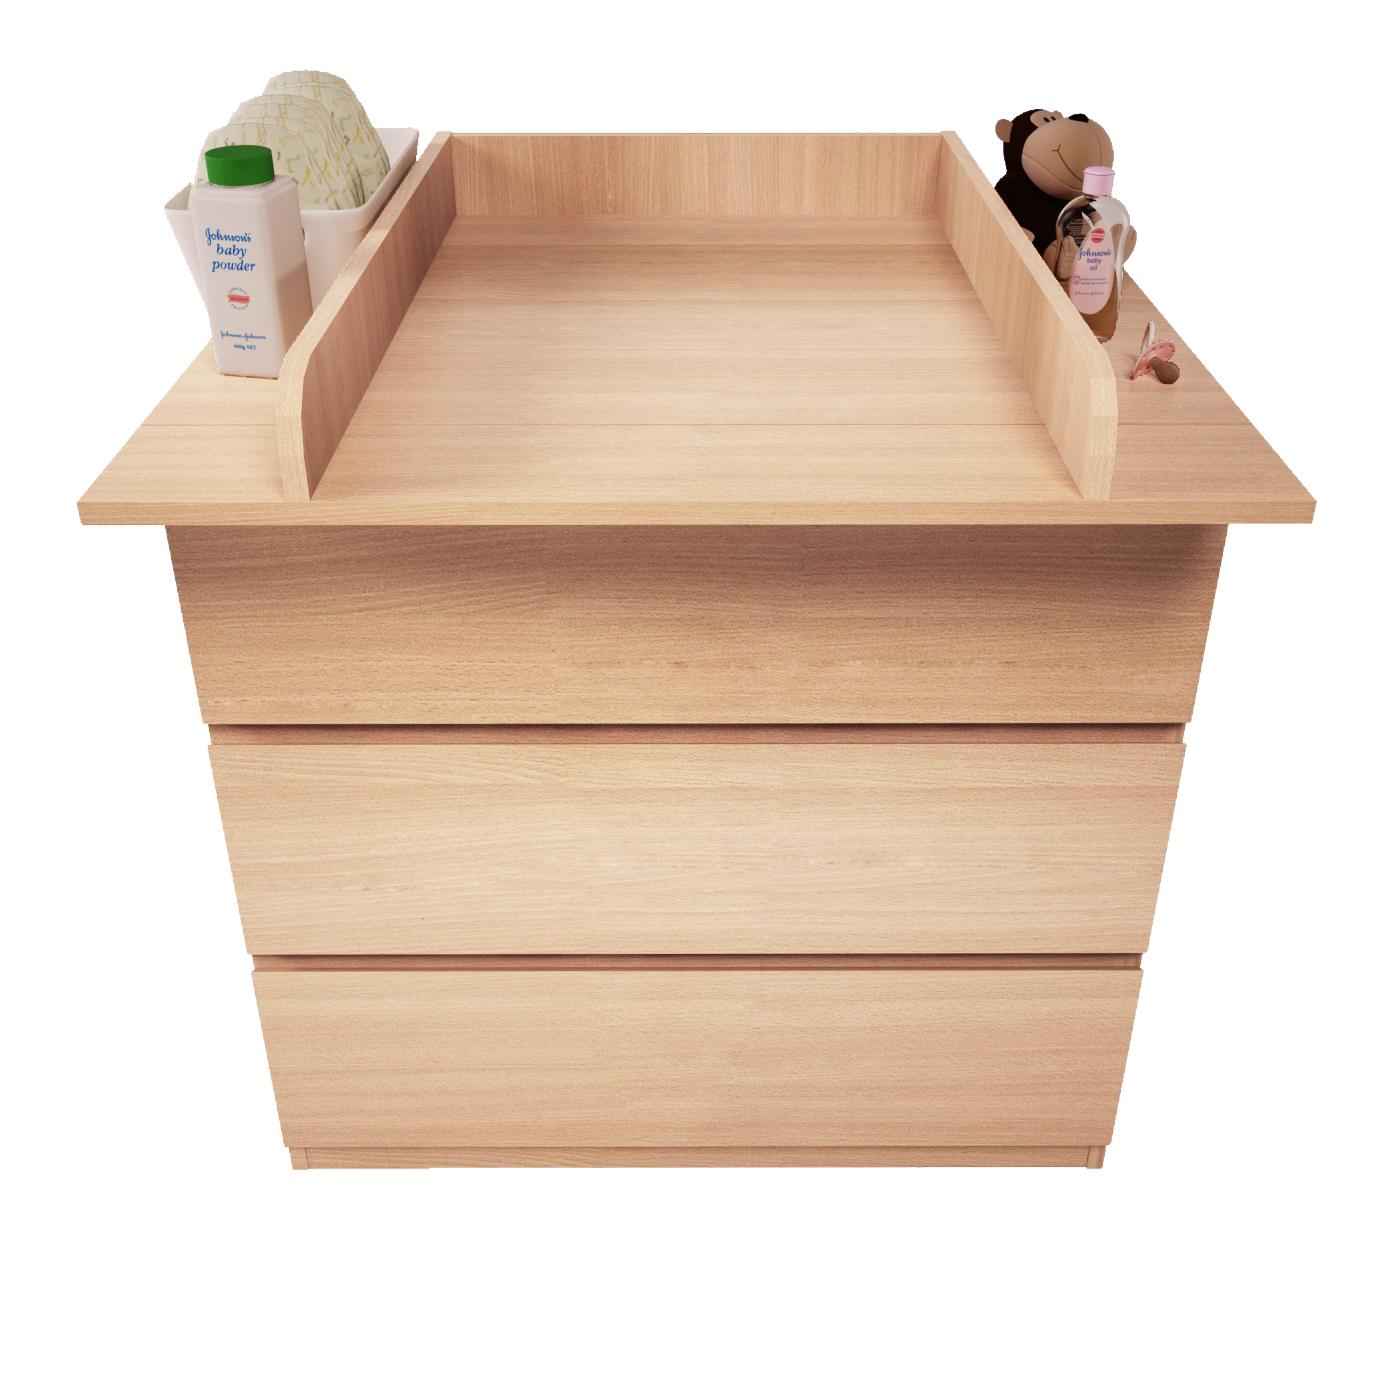 Polini-Kids-Wickelaufsatz-fuer-Kommode-MALM-IKEA-Farbauswahl